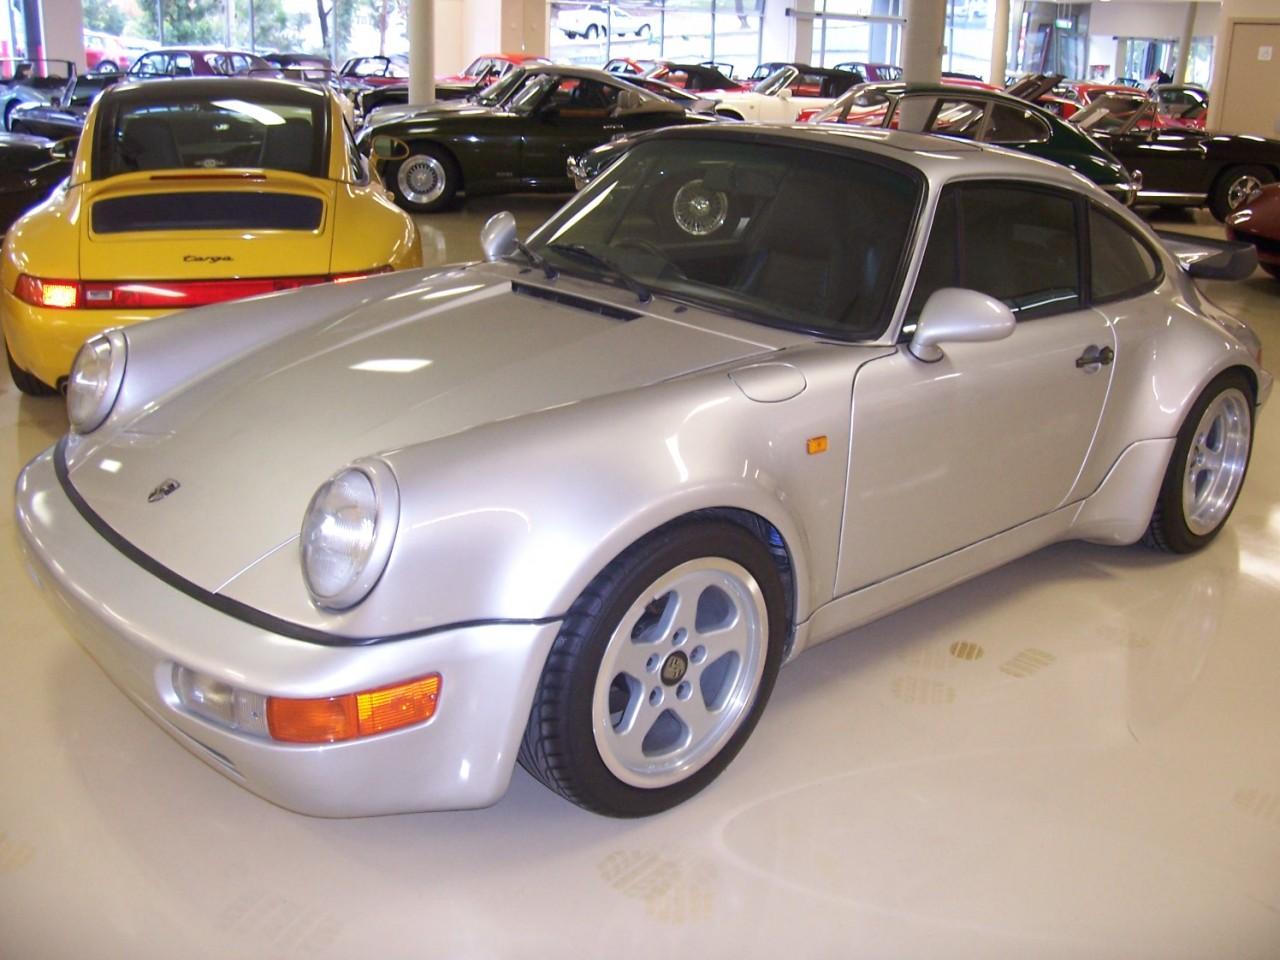 for sale 1980 porsche 930 911 turbo performancedrive. Black Bedroom Furniture Sets. Home Design Ideas